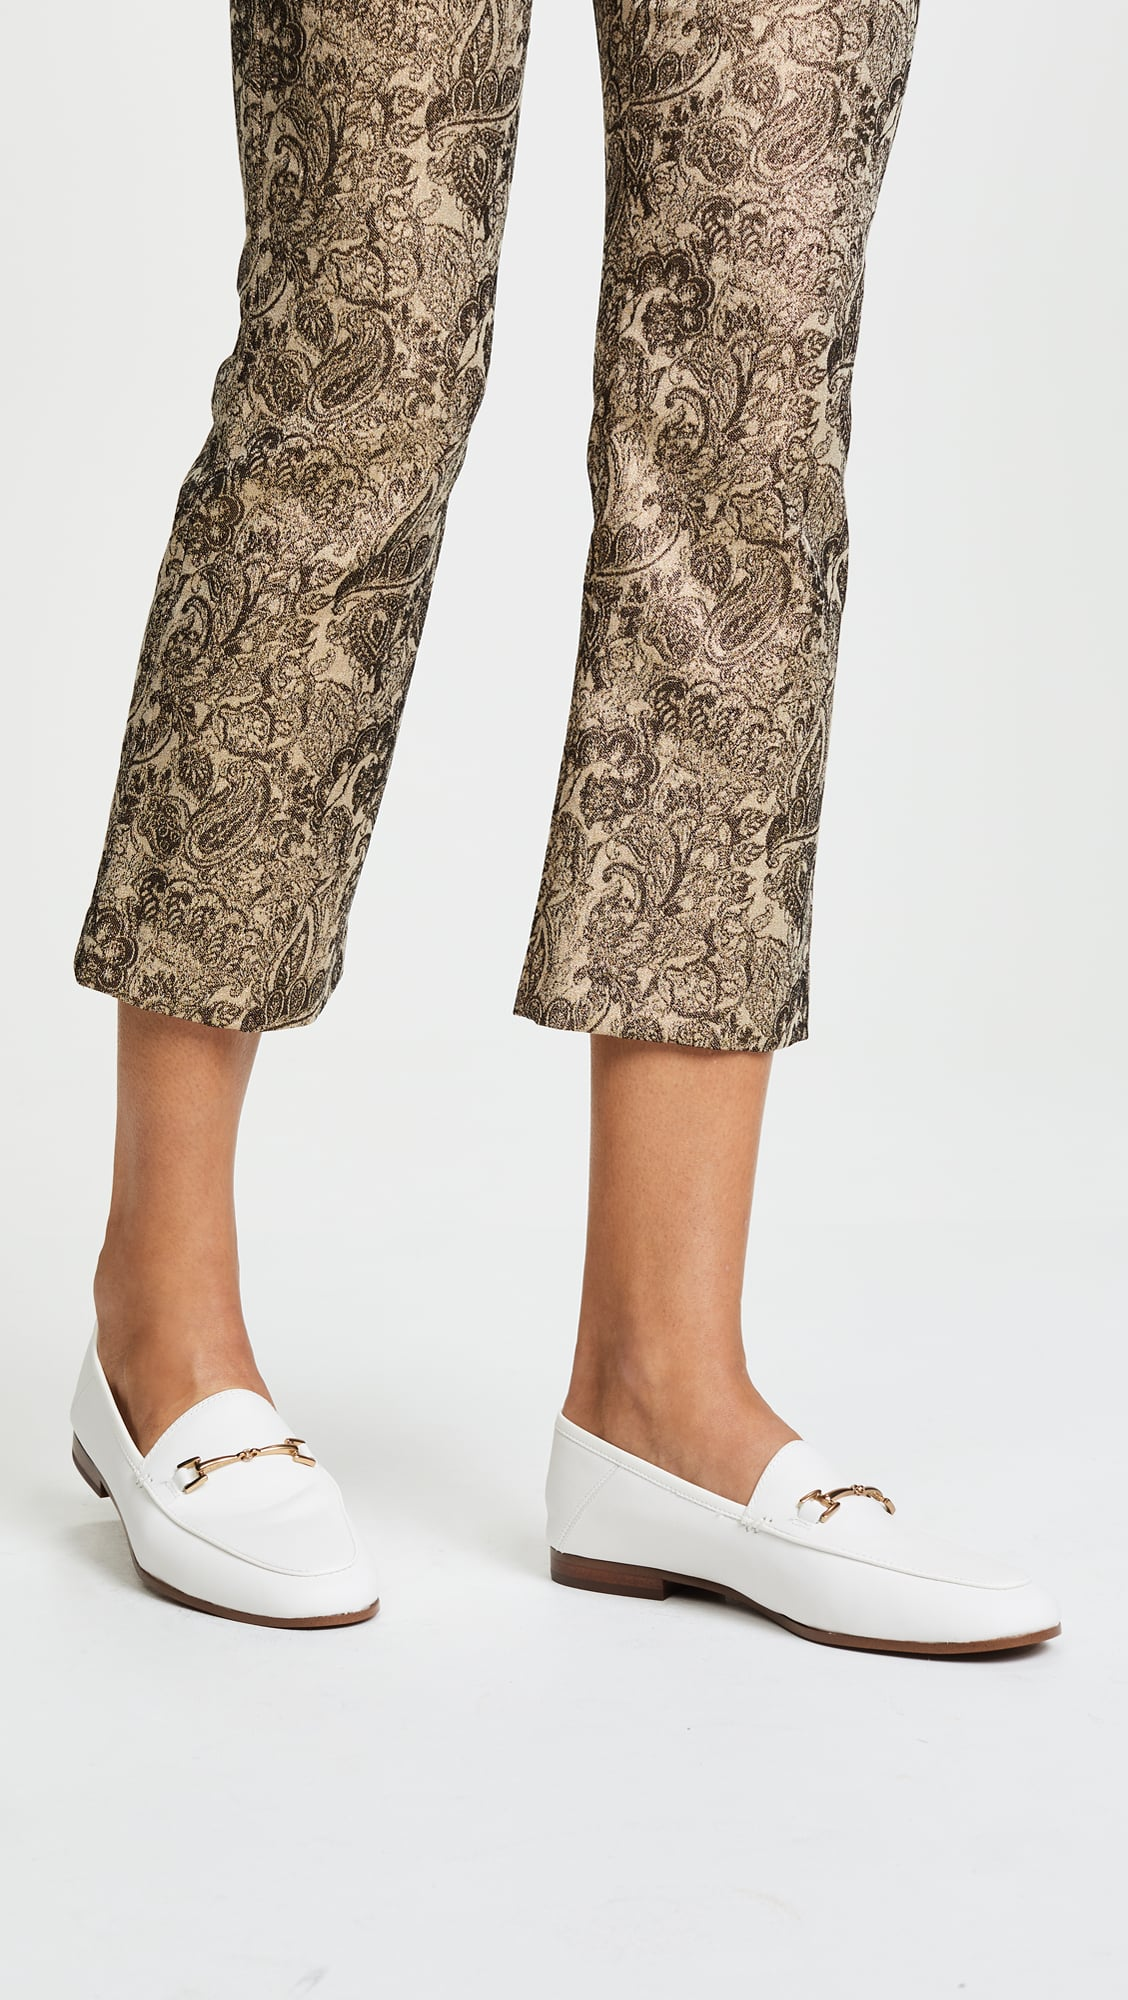 Sam Edelman Loraine Loafers | Shopbop